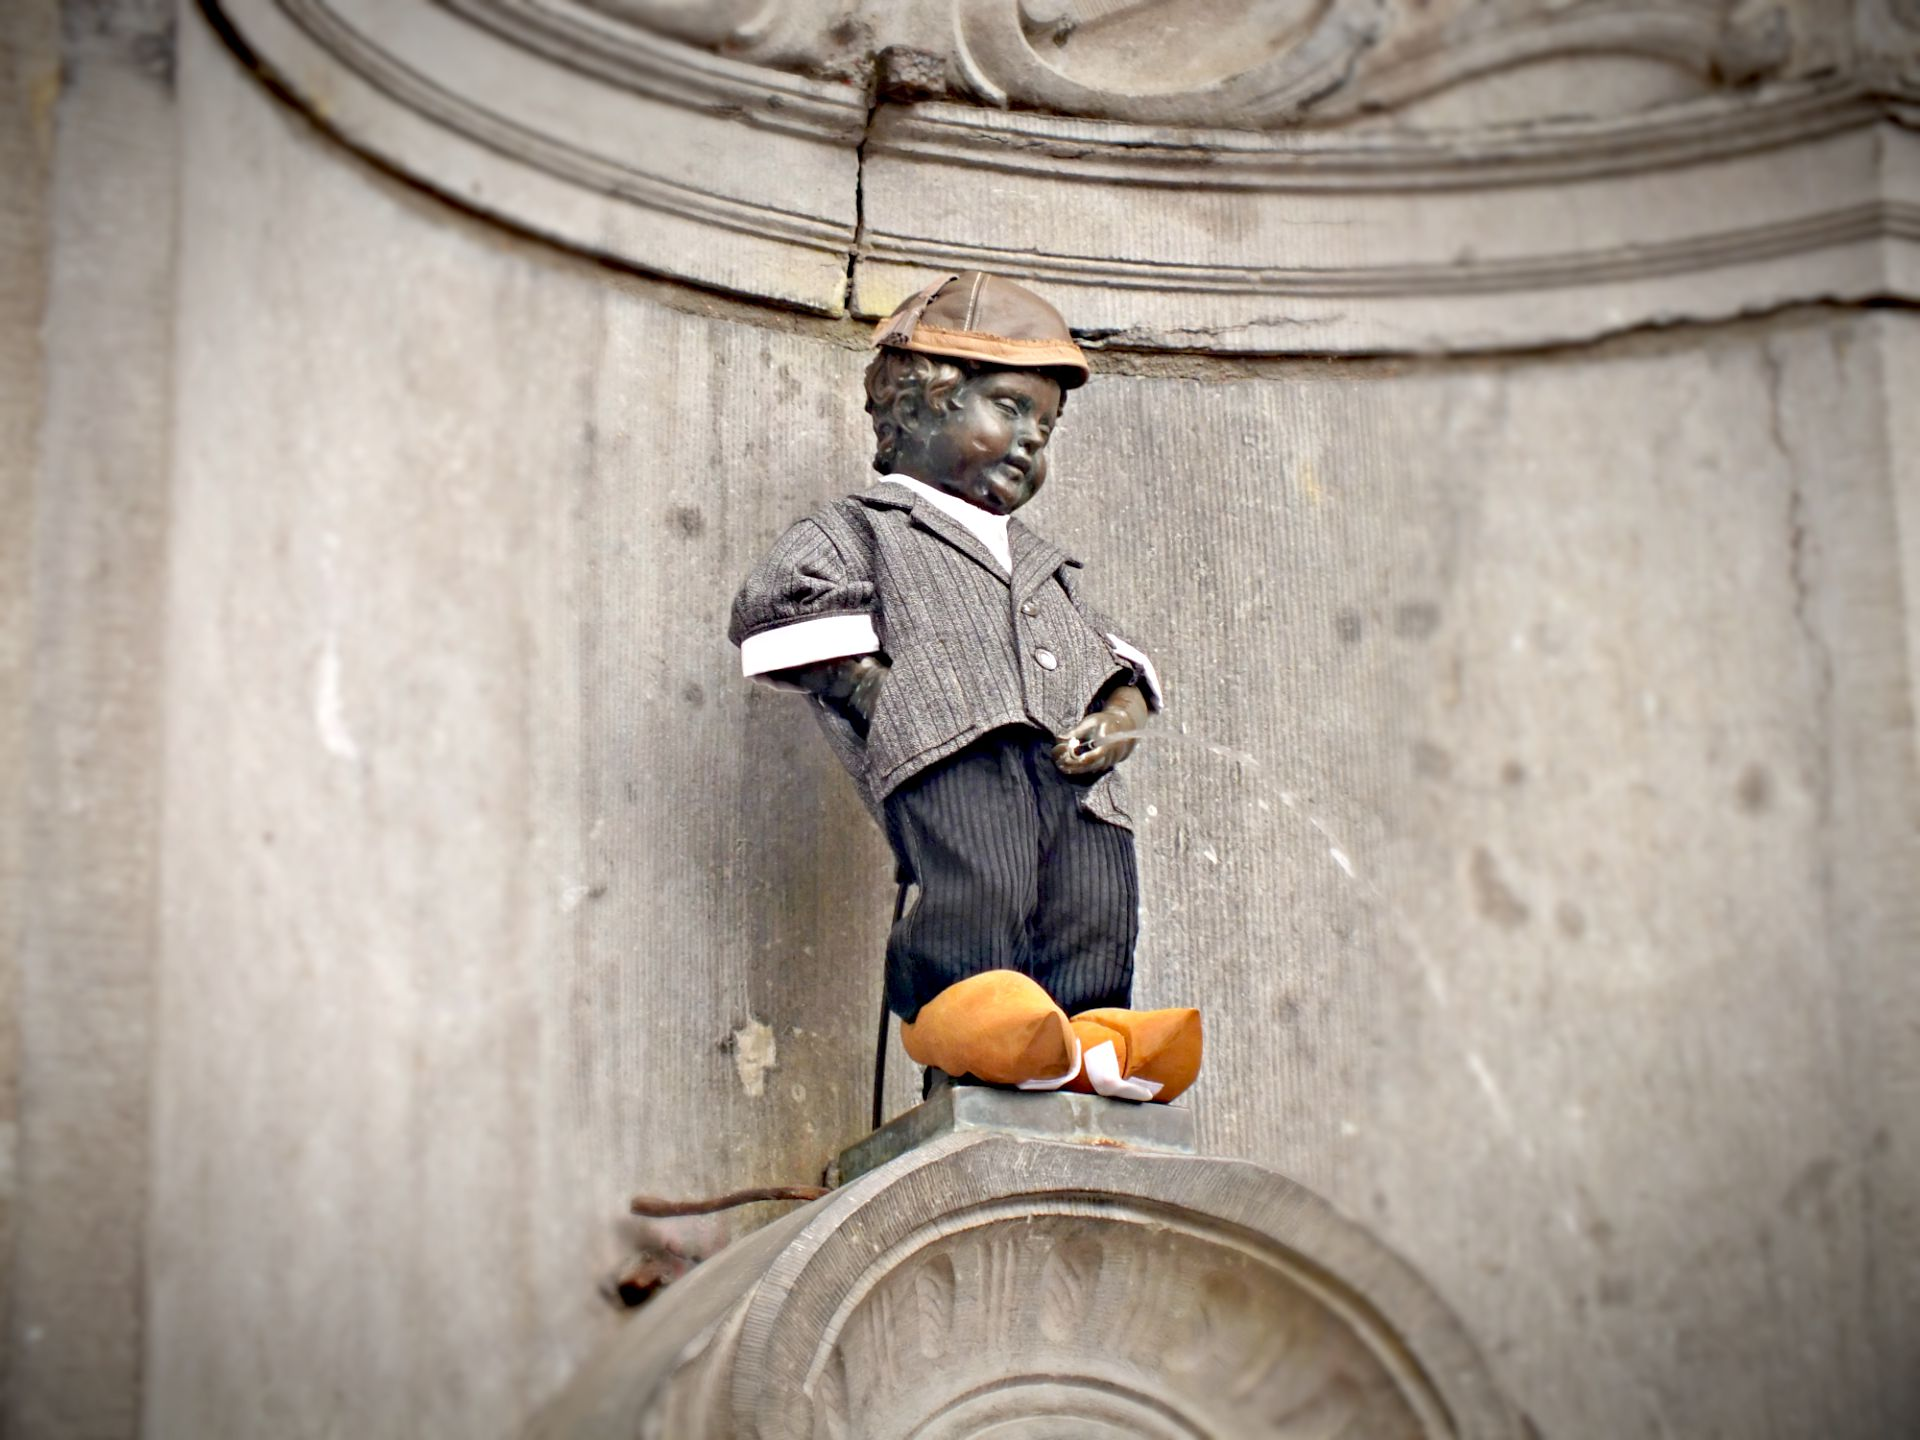 Maenneken Pis in Brüssel, Belgien